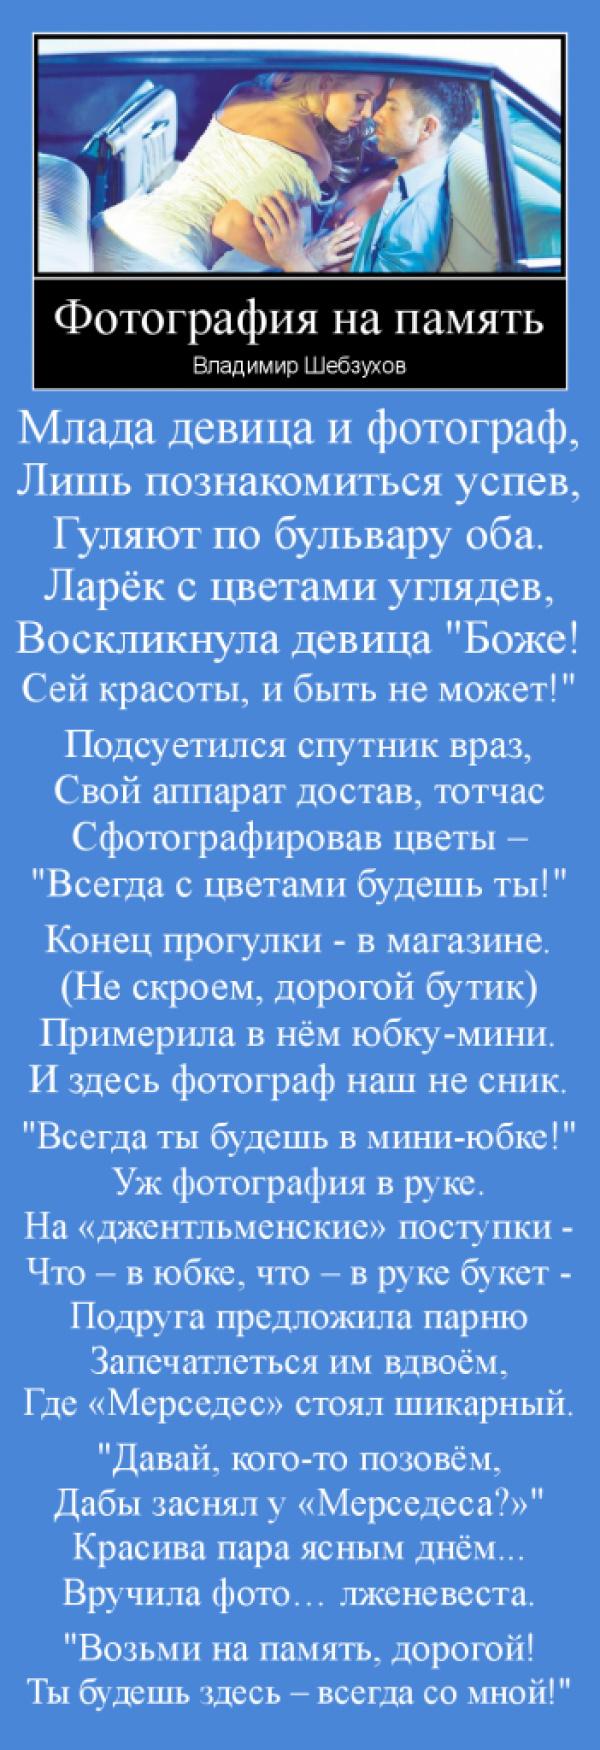 Владимир Шебзухов Притчи  - Страница 45 Ieseic11